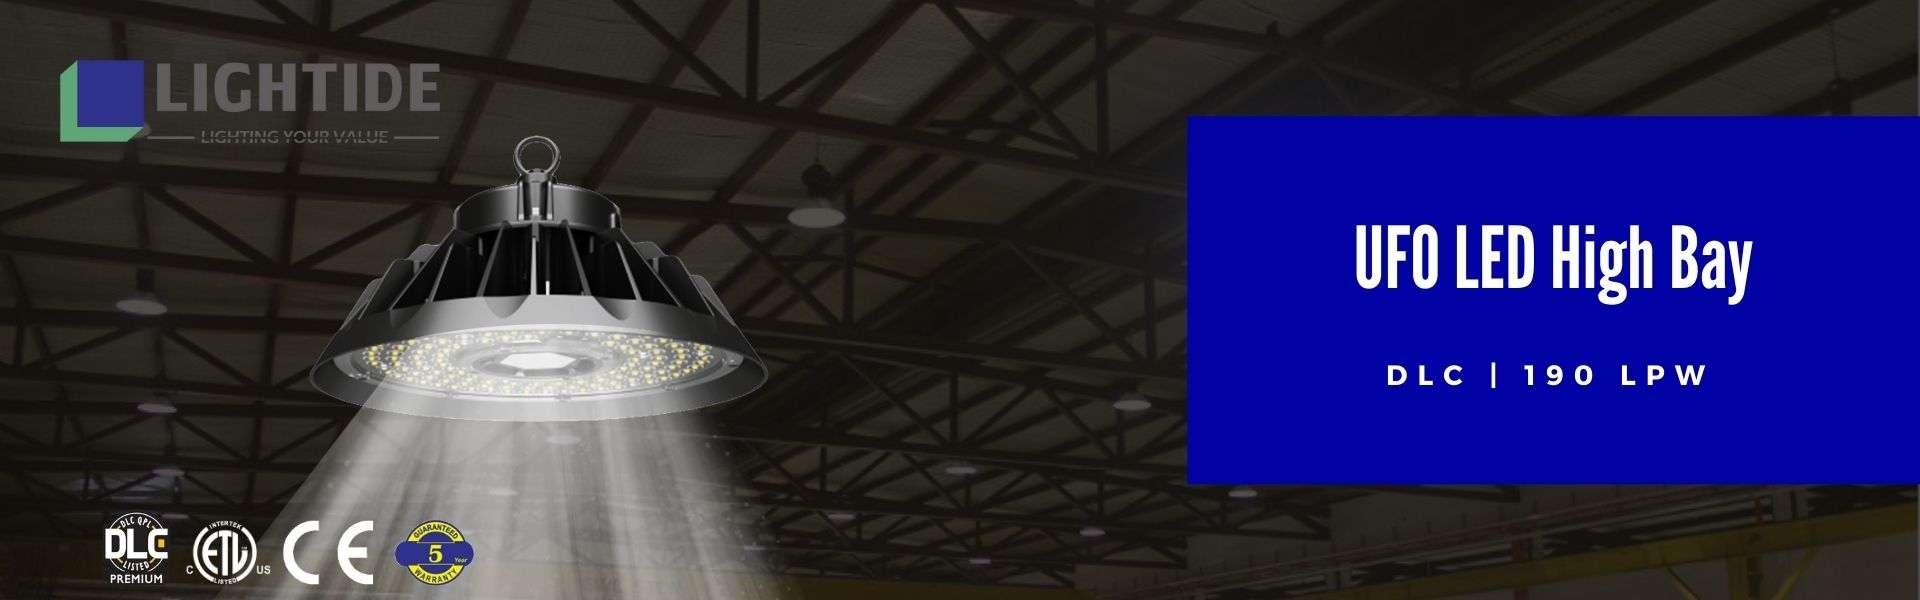 Lightide DLC QPL ufo led High Bay Lights 190 LPW